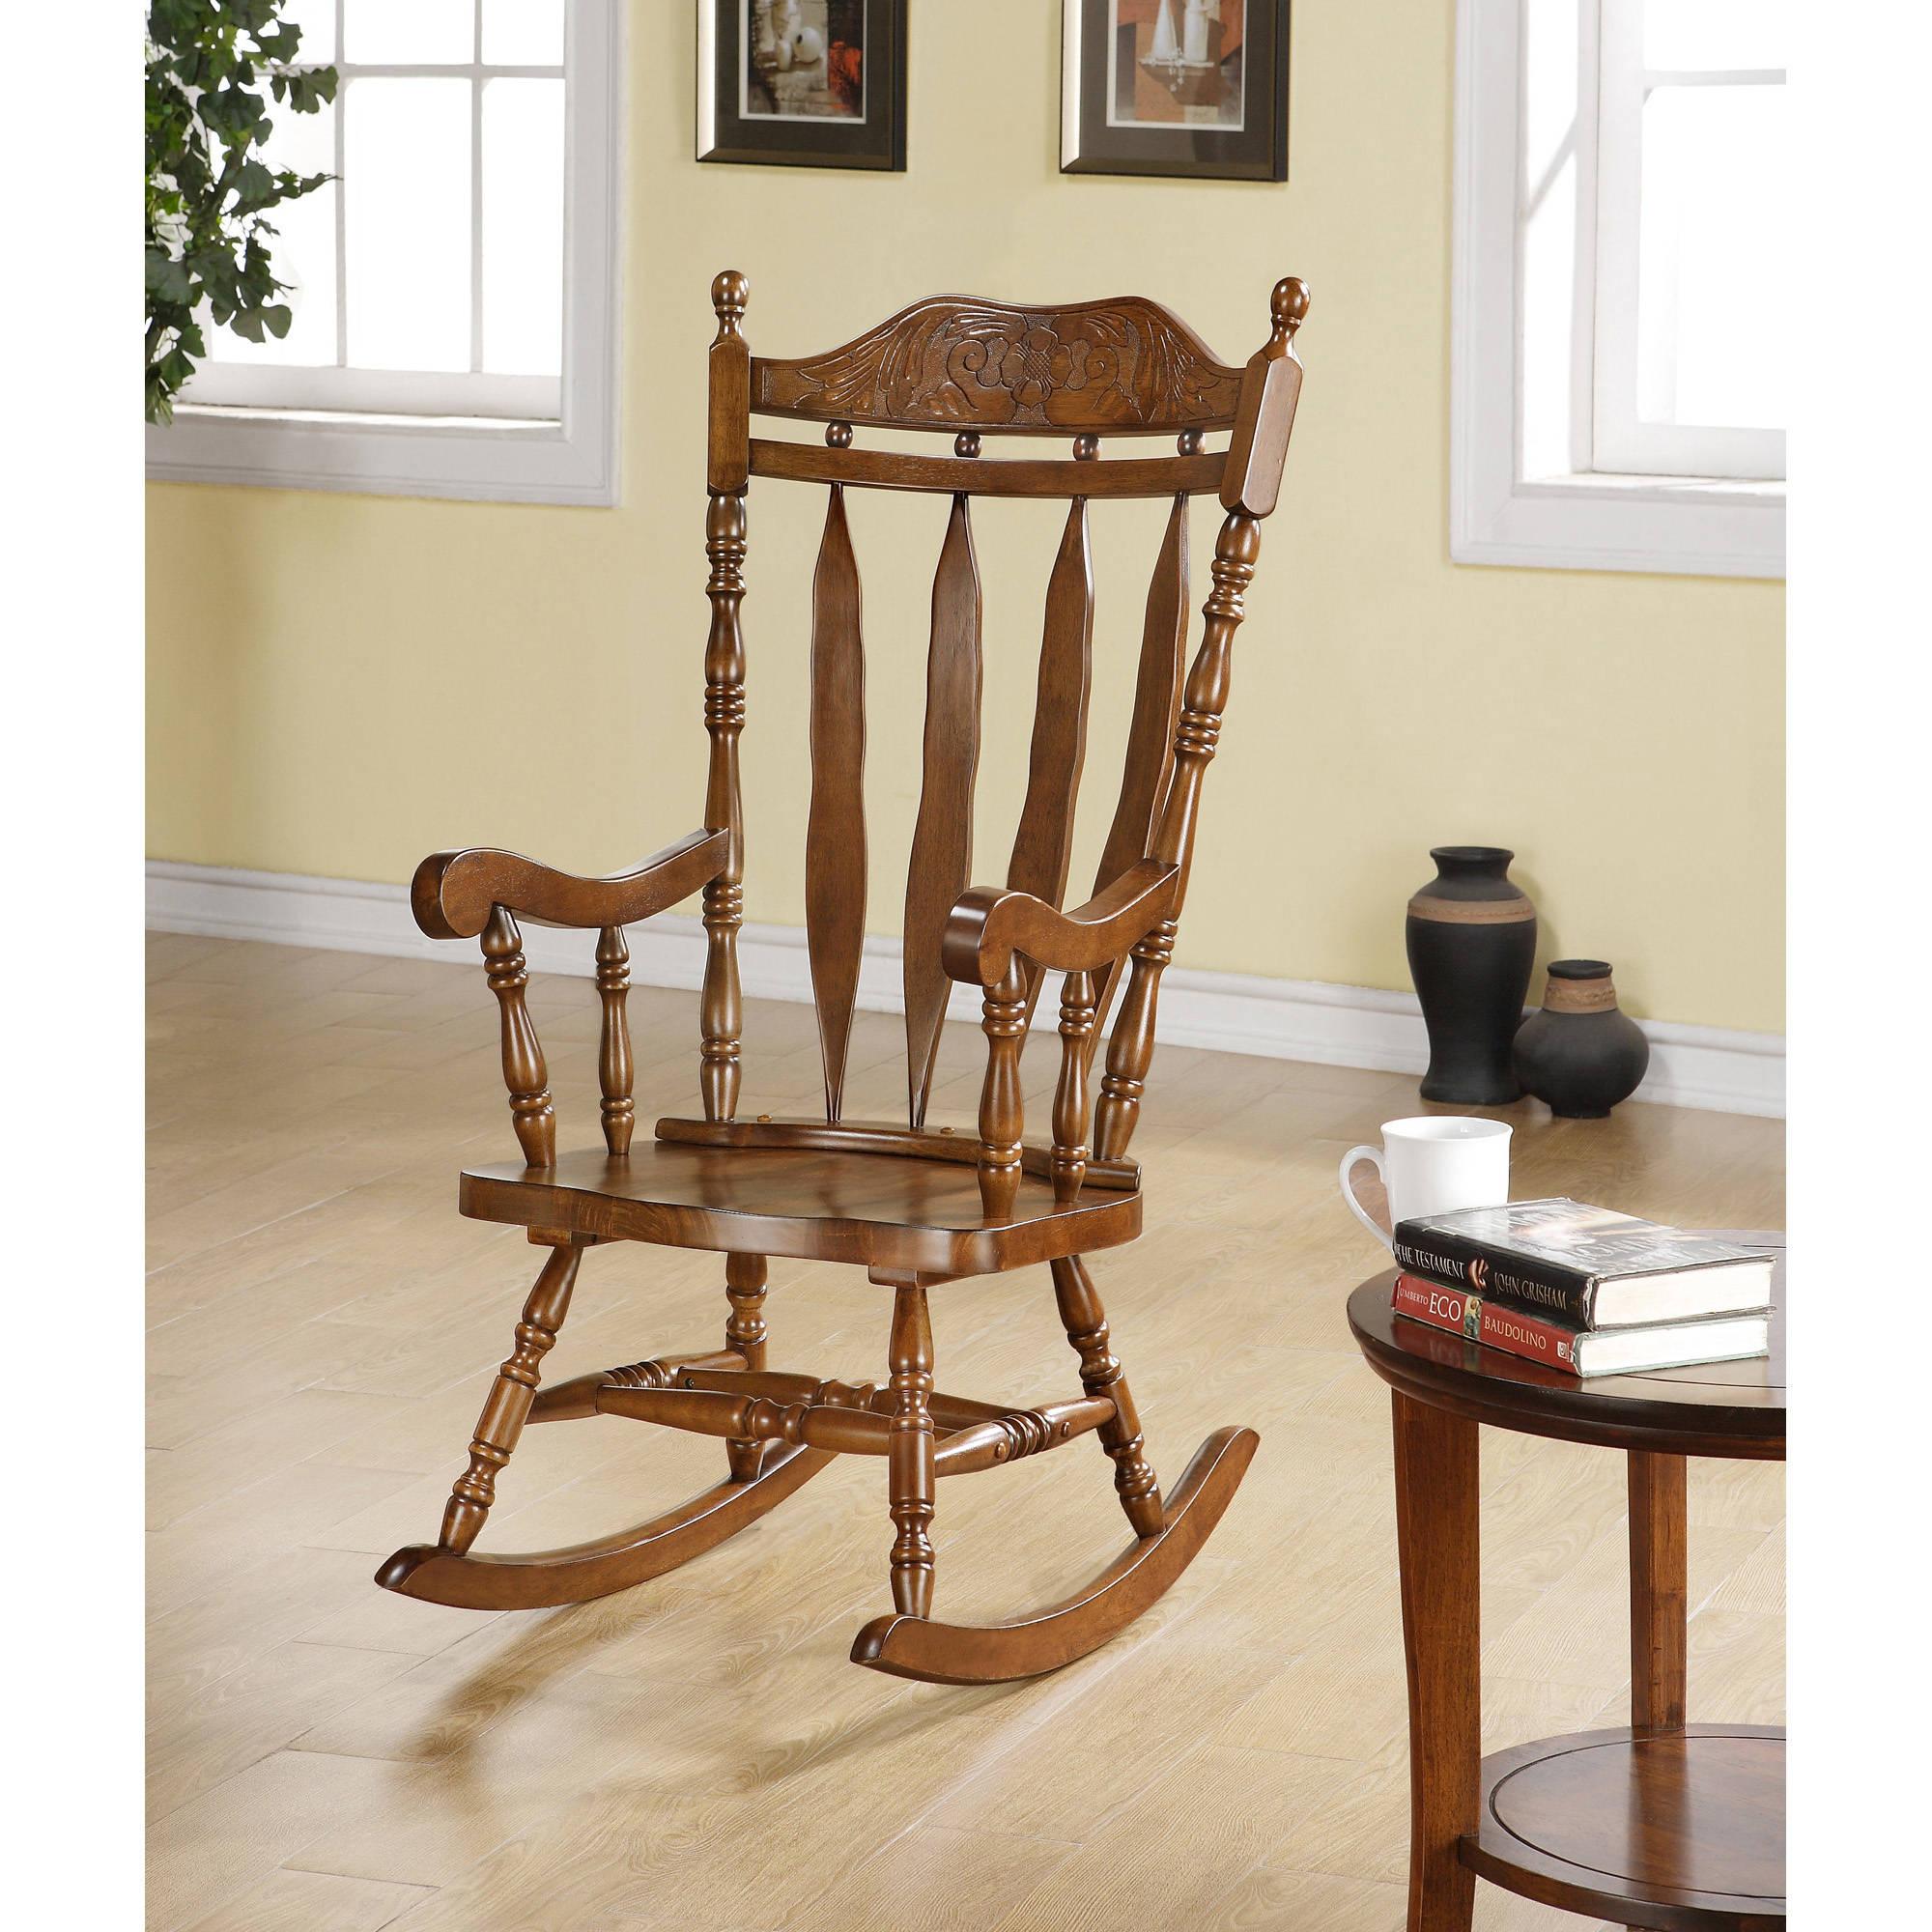 Inspiration about Monarch Dark Walnut 45h In. Solid Wood Rocking Chair With Dark Walnut Brown Wooden Rocking Chairs (#4 of 20)